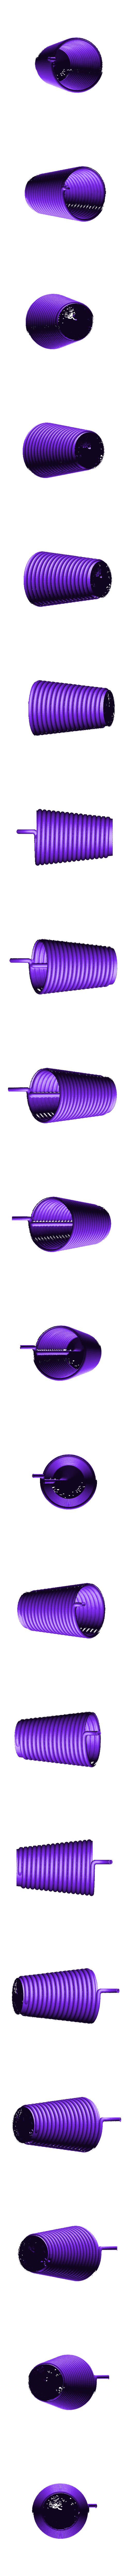 straw-glass-practical-v5.stl Download free STL file Big StrawGlass - Practical • 3D print design, bLiTzJoN